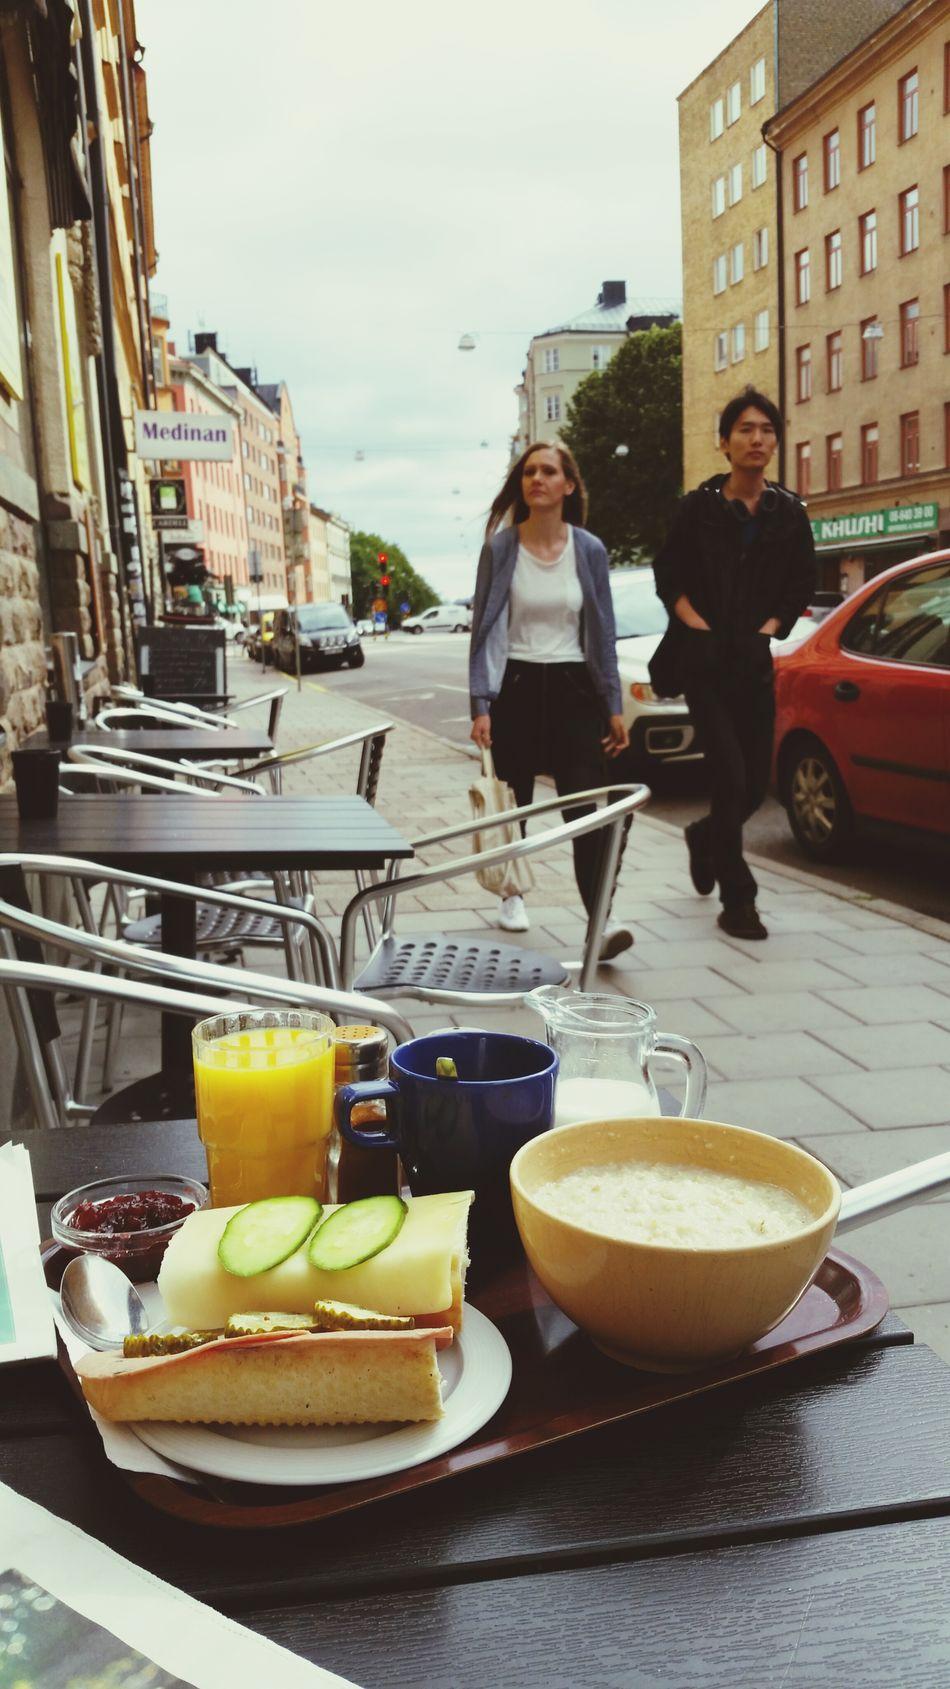 The EyeEm Breakfast Club Södermalm Samsung S5 Södermalm Stockholm Stockholm Coffe And Sweets Here Belongs To Me